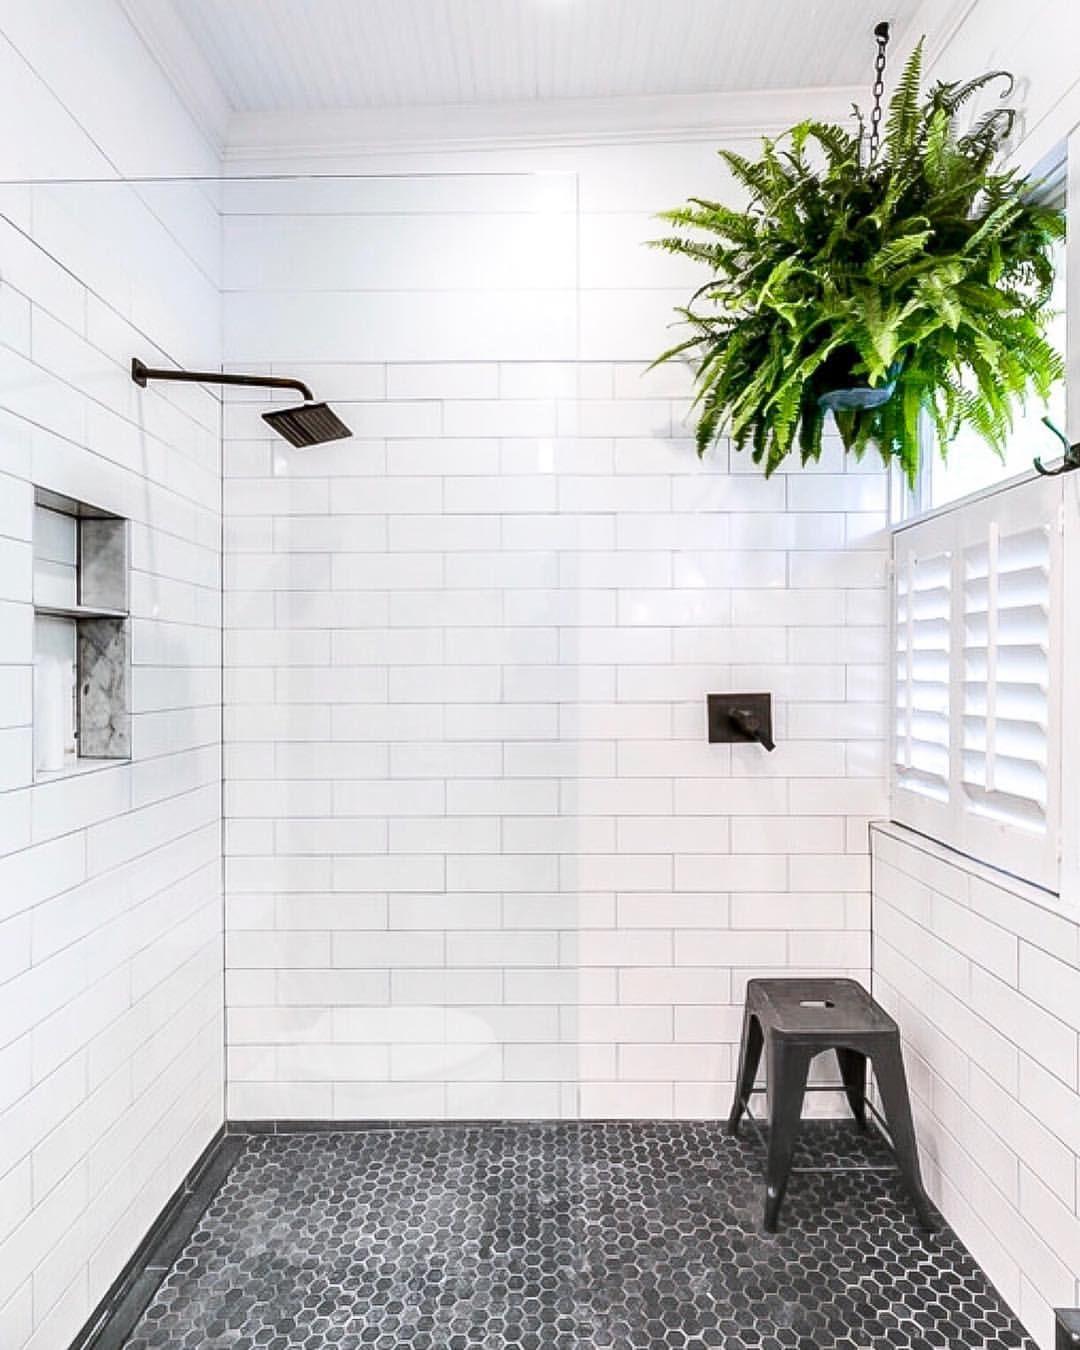 "Brynn on Instagram: ""Fun little #bathroom #renovation tip for walk-in showers"